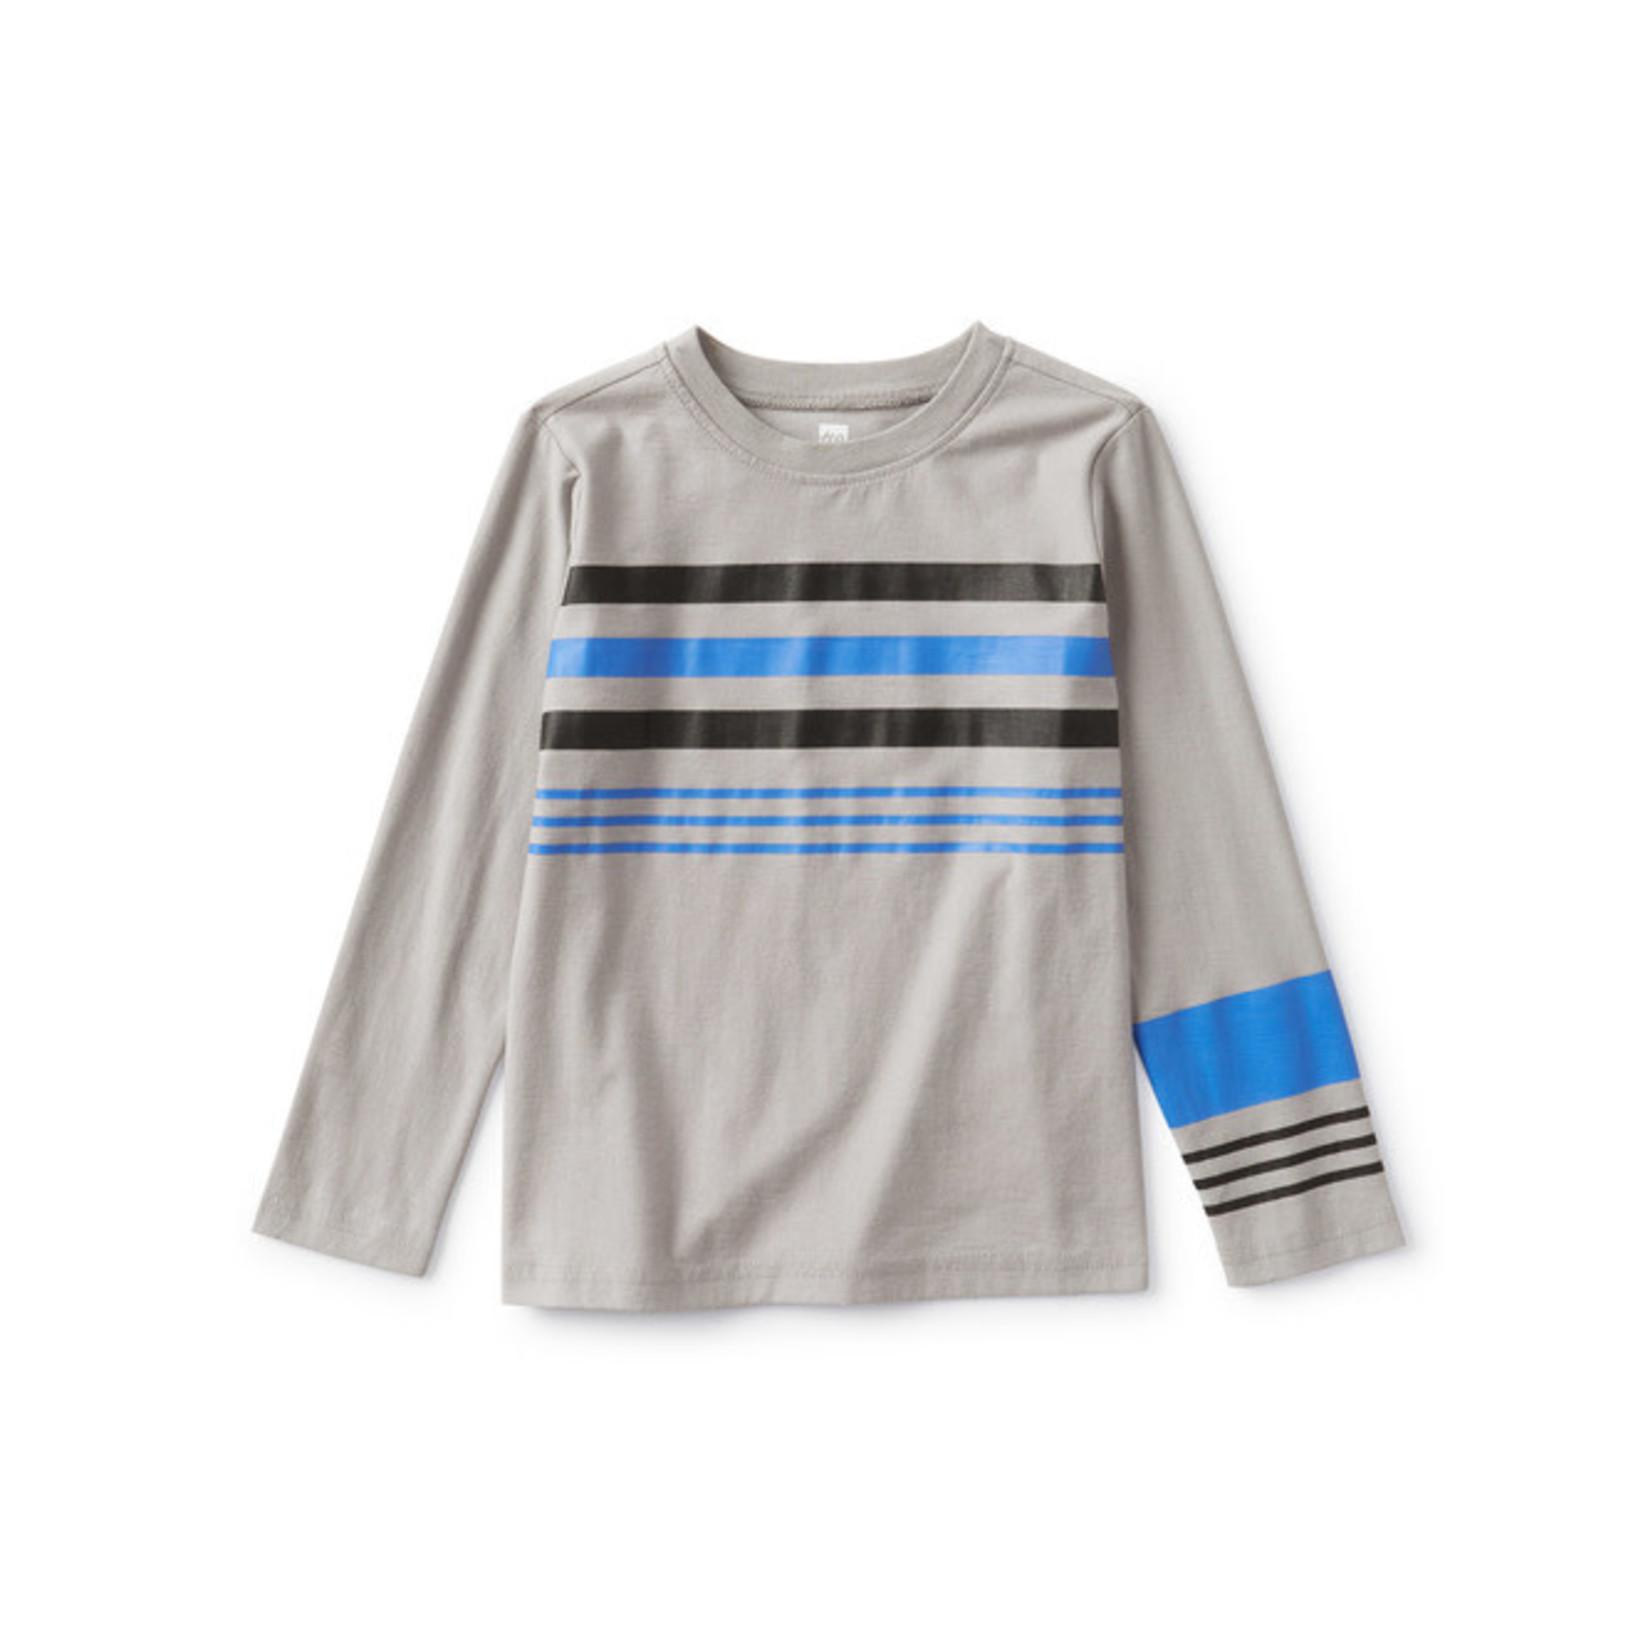 Tea Collection Asymmetrical Stripe Tee - Storm Grey